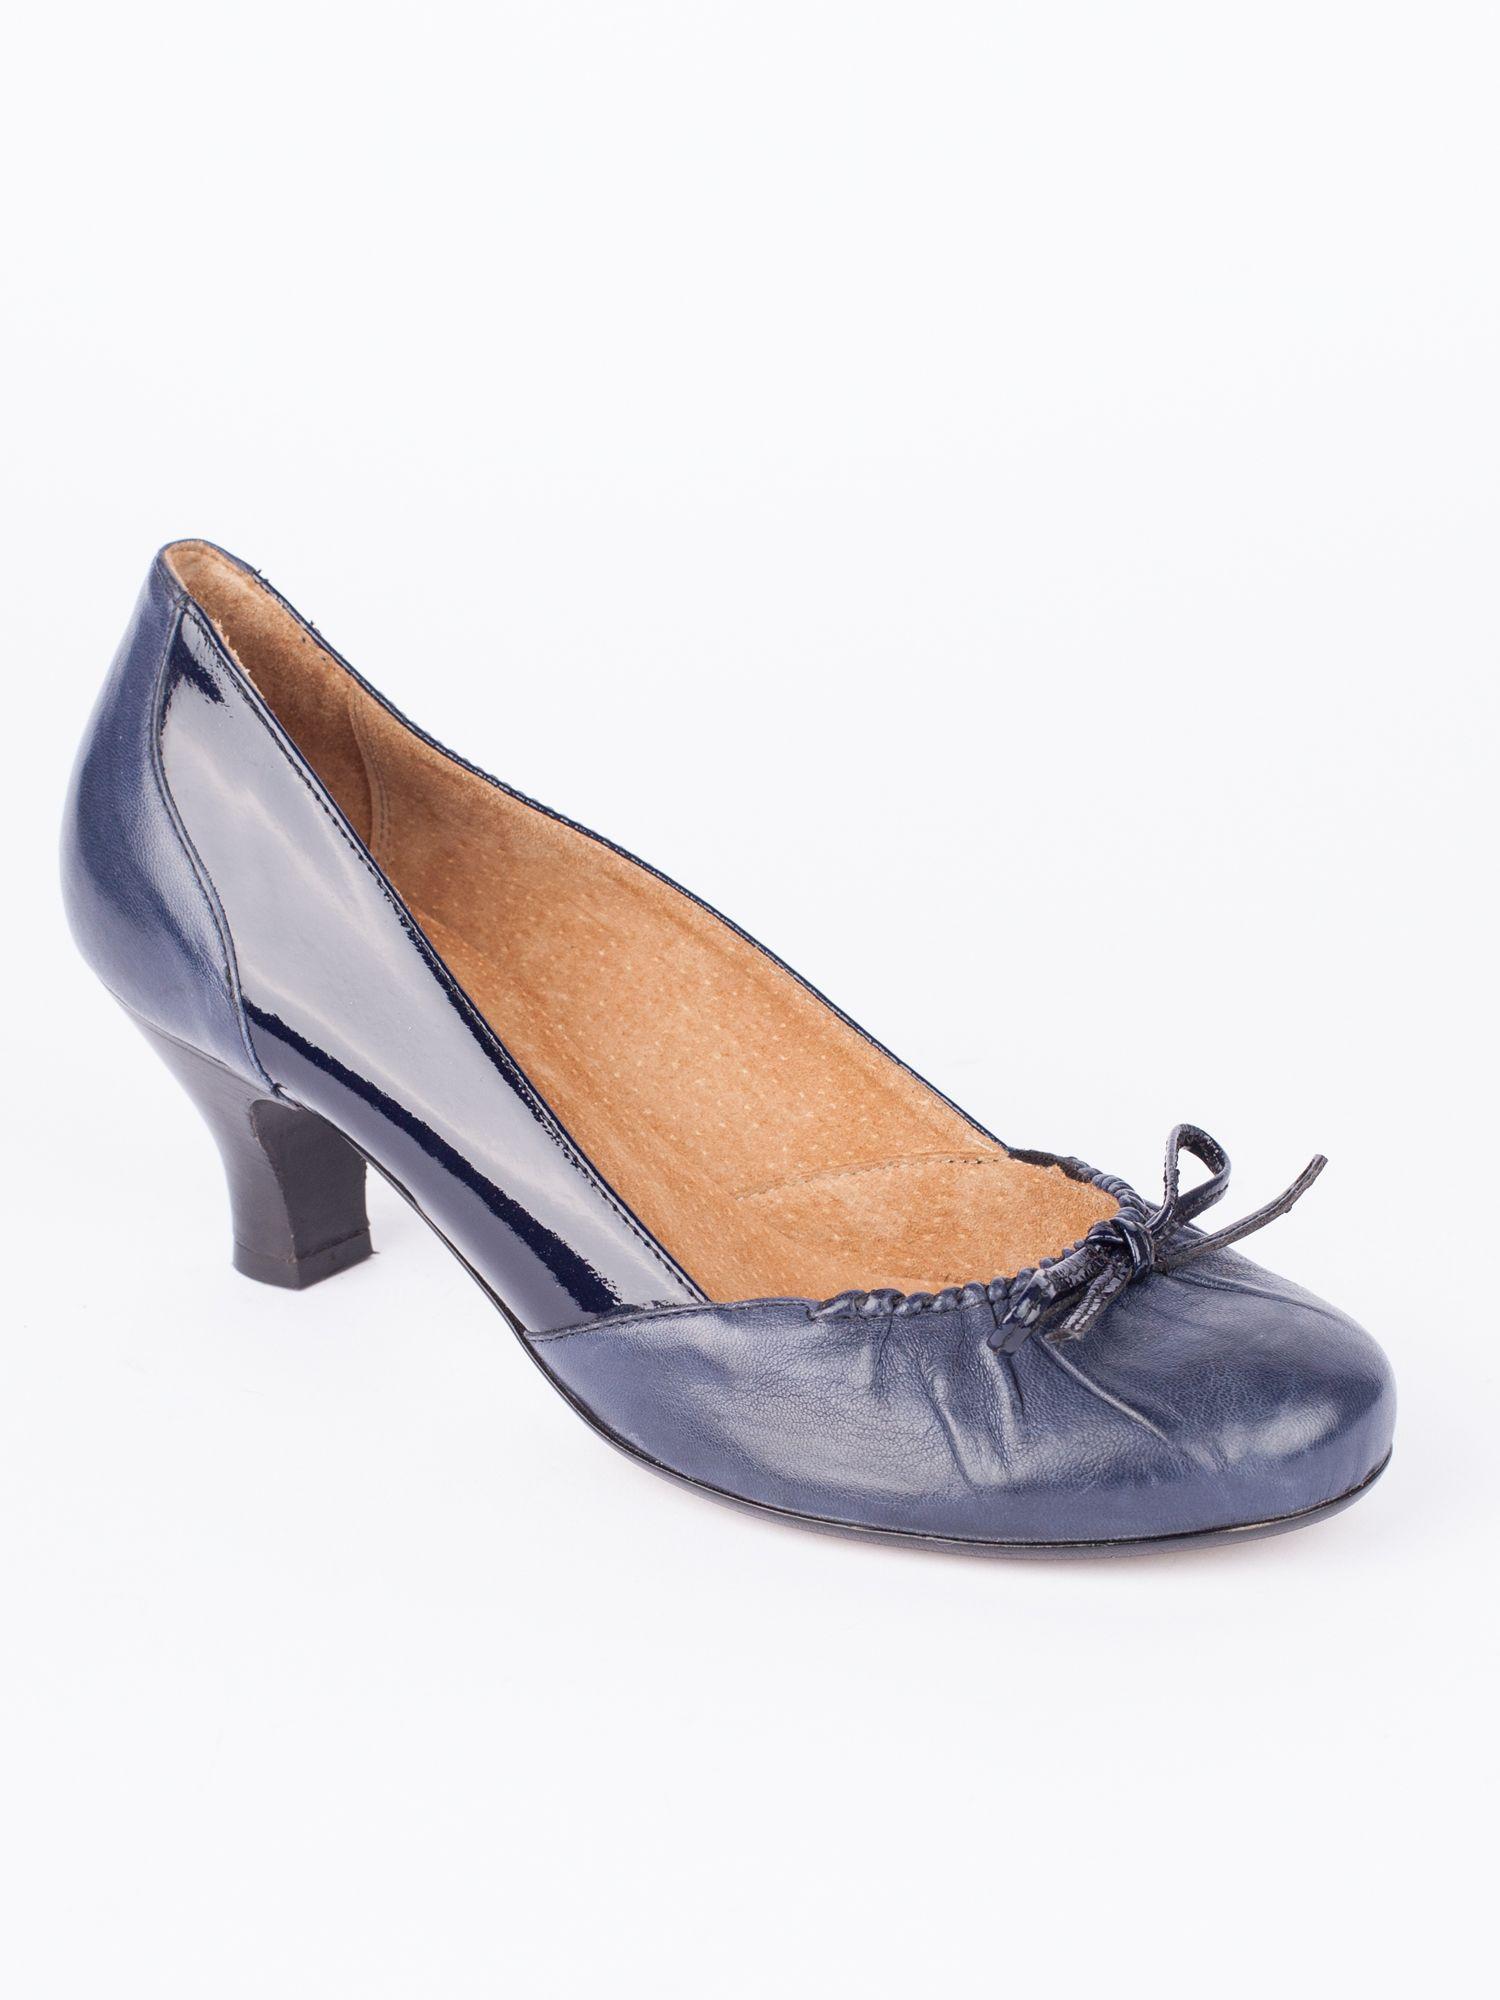 Jones Bootmaker Shoes Blue